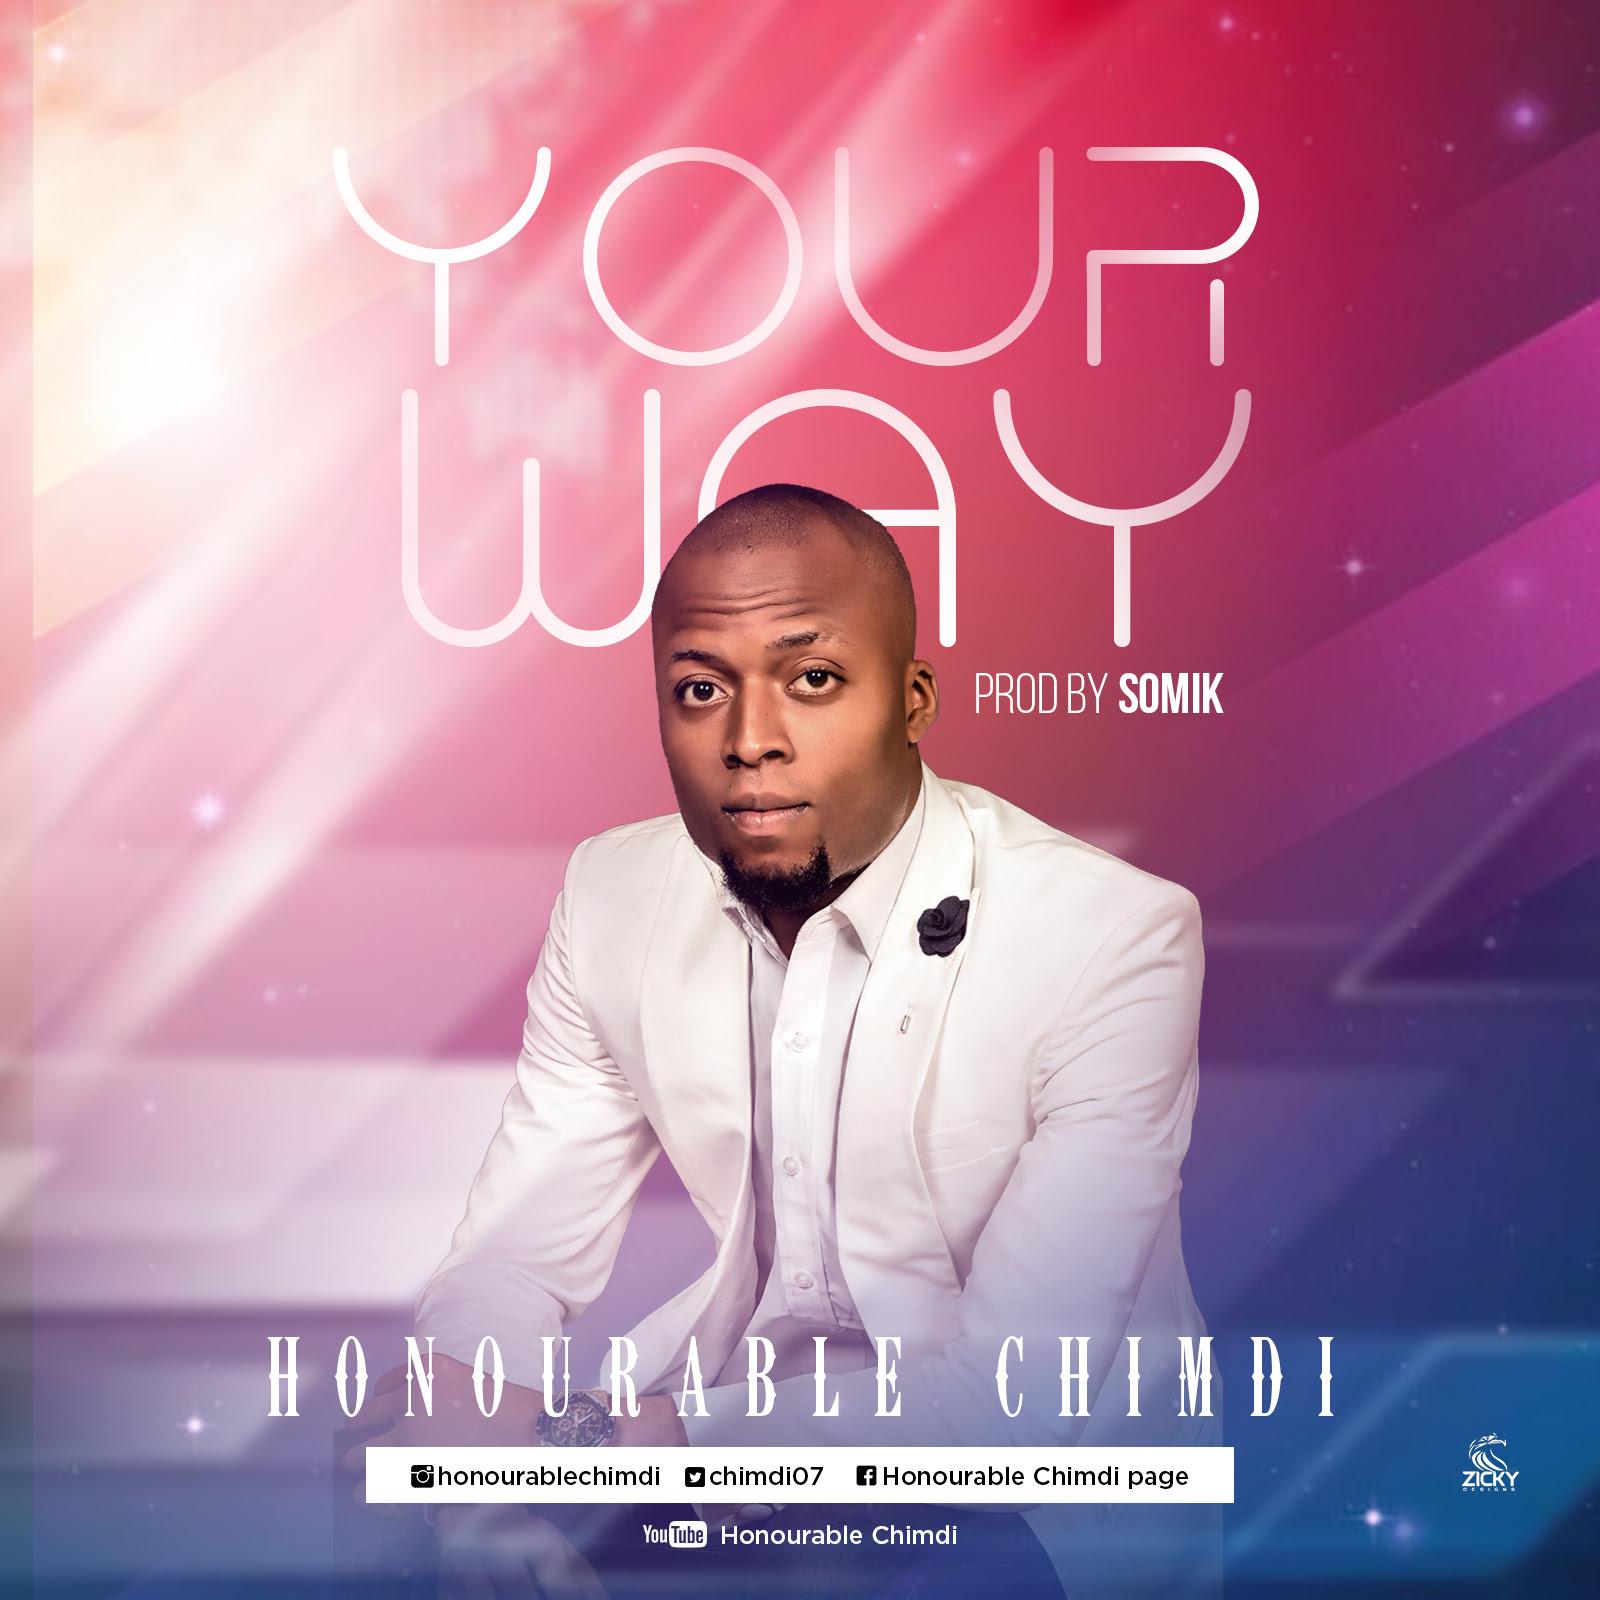 DOWNLOAD MP3: Honourable Chimdi - Your Way